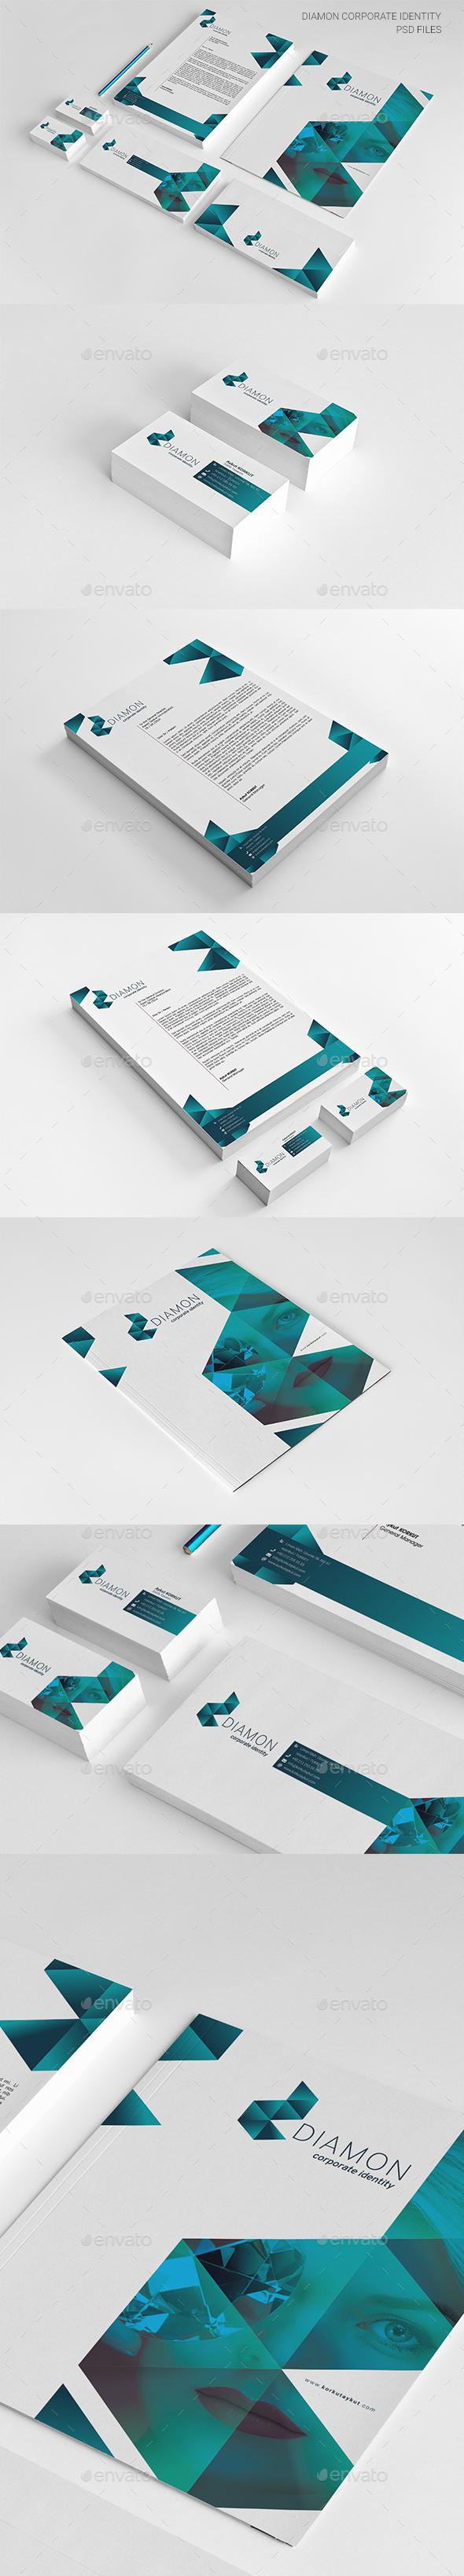 Diamond Corporate Identity Package - Stationery Print Templates